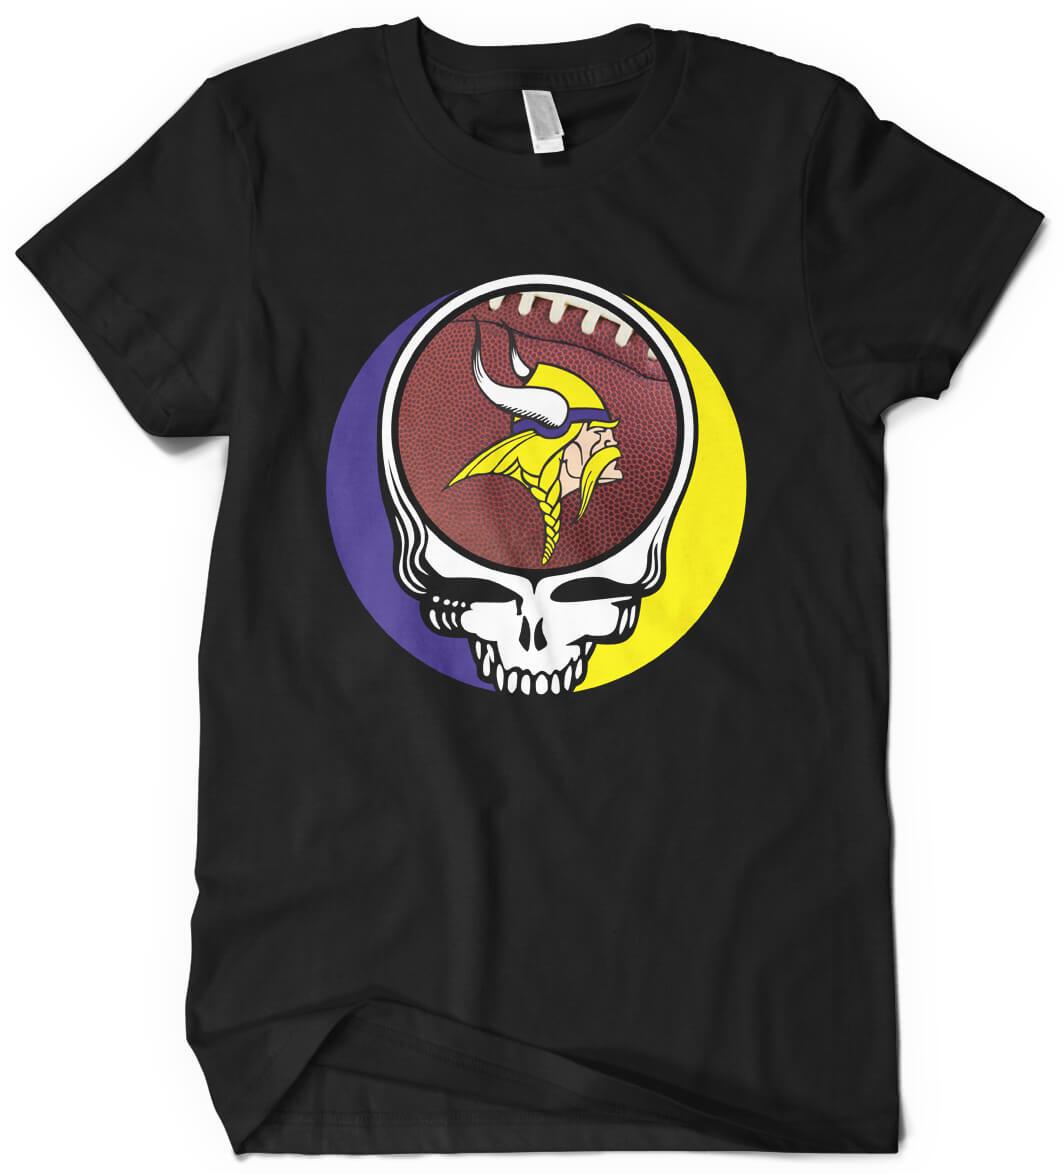 Long Island Custom Printing Sweatshirts T Shirt